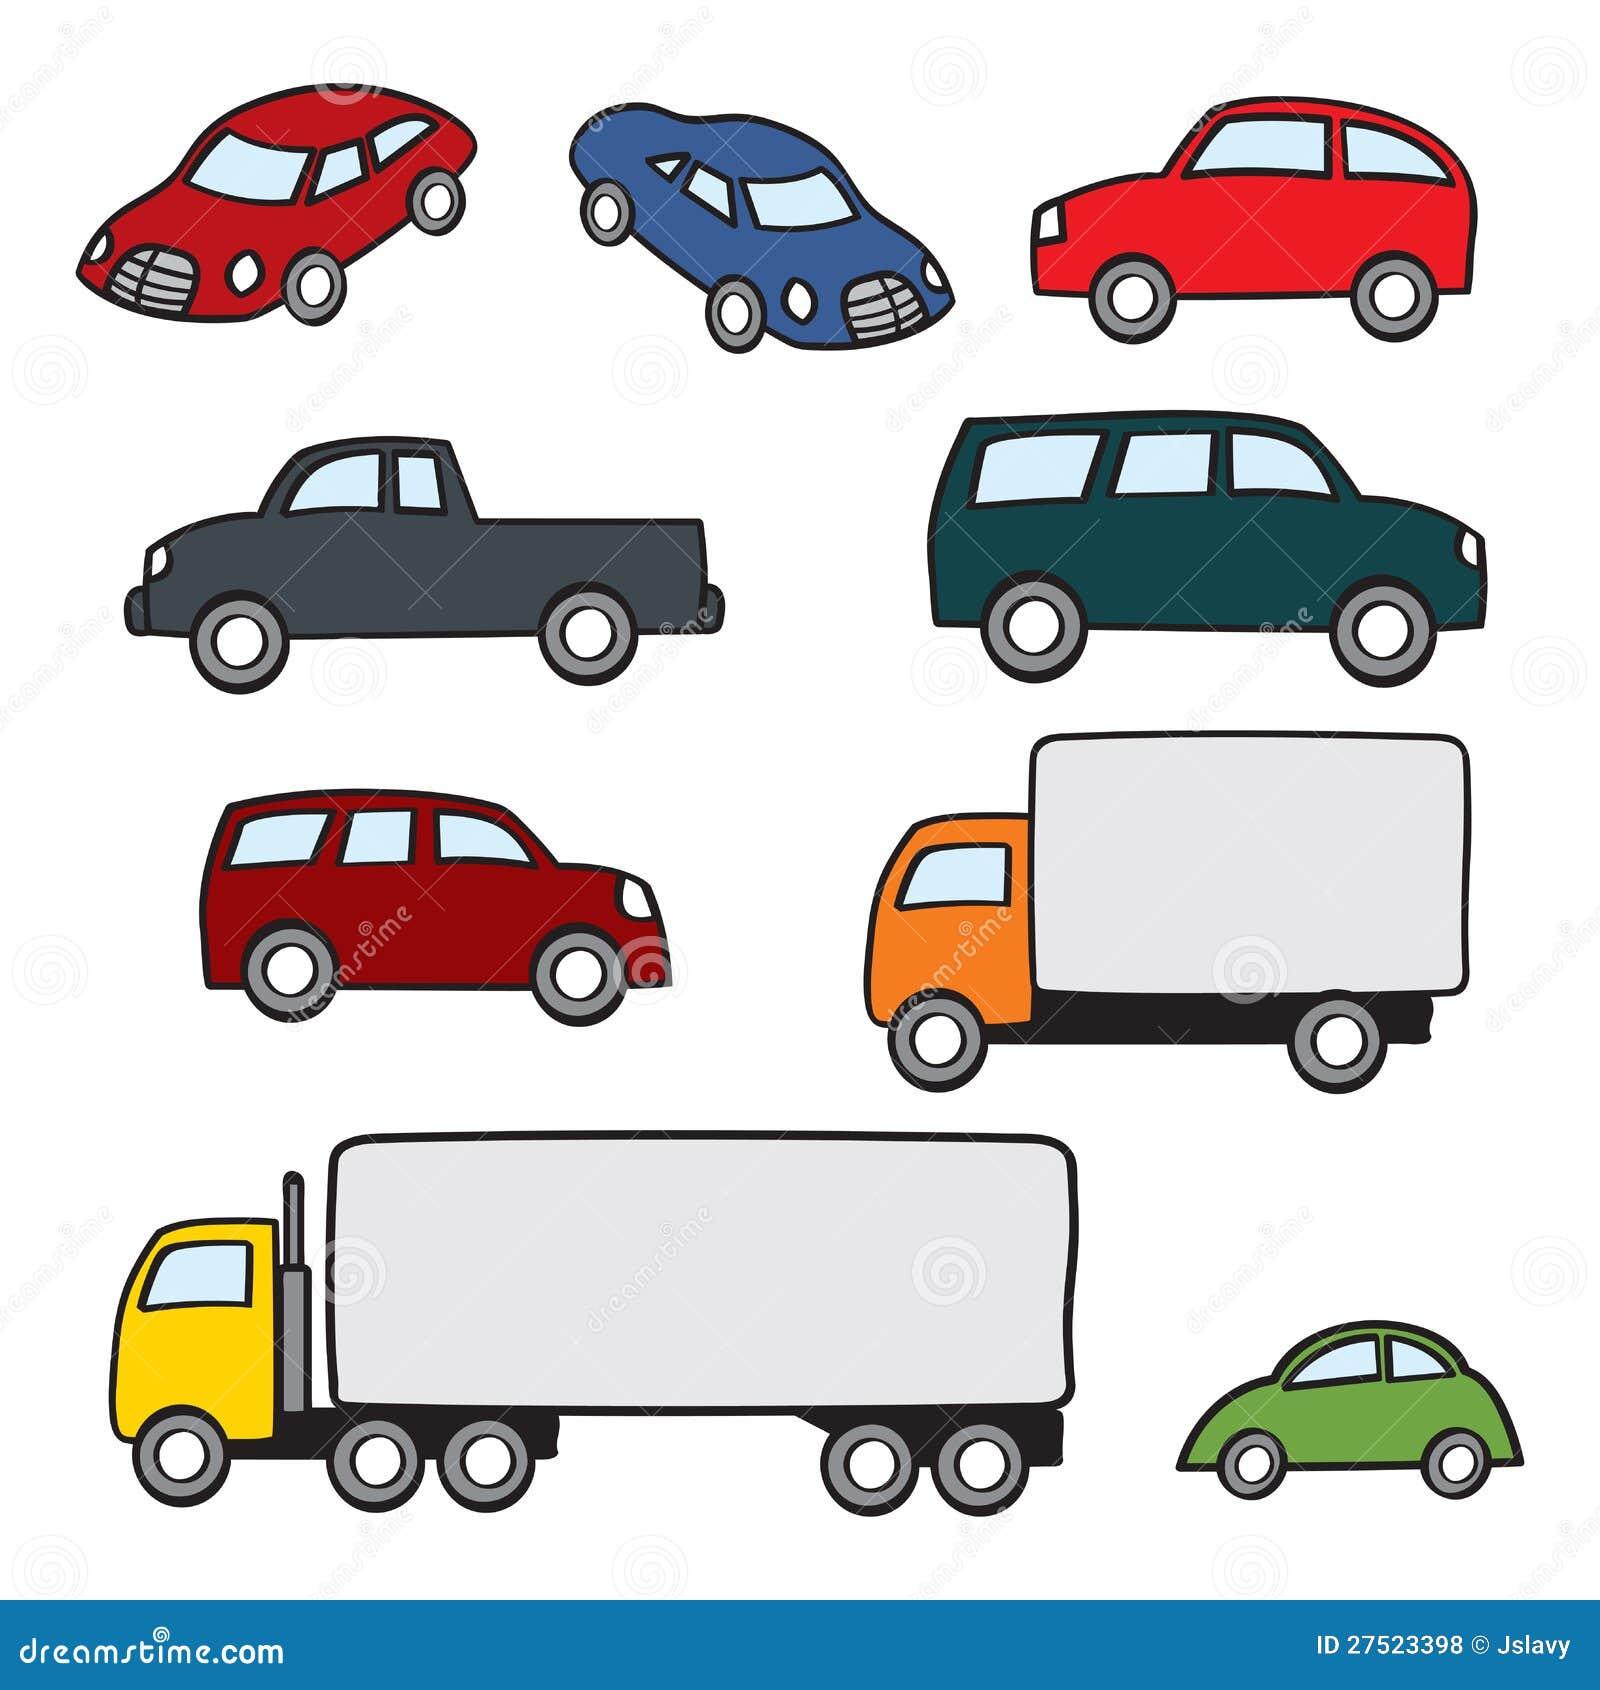 Assorted Cartoon Vehicles Stock Vector. Illustration Of